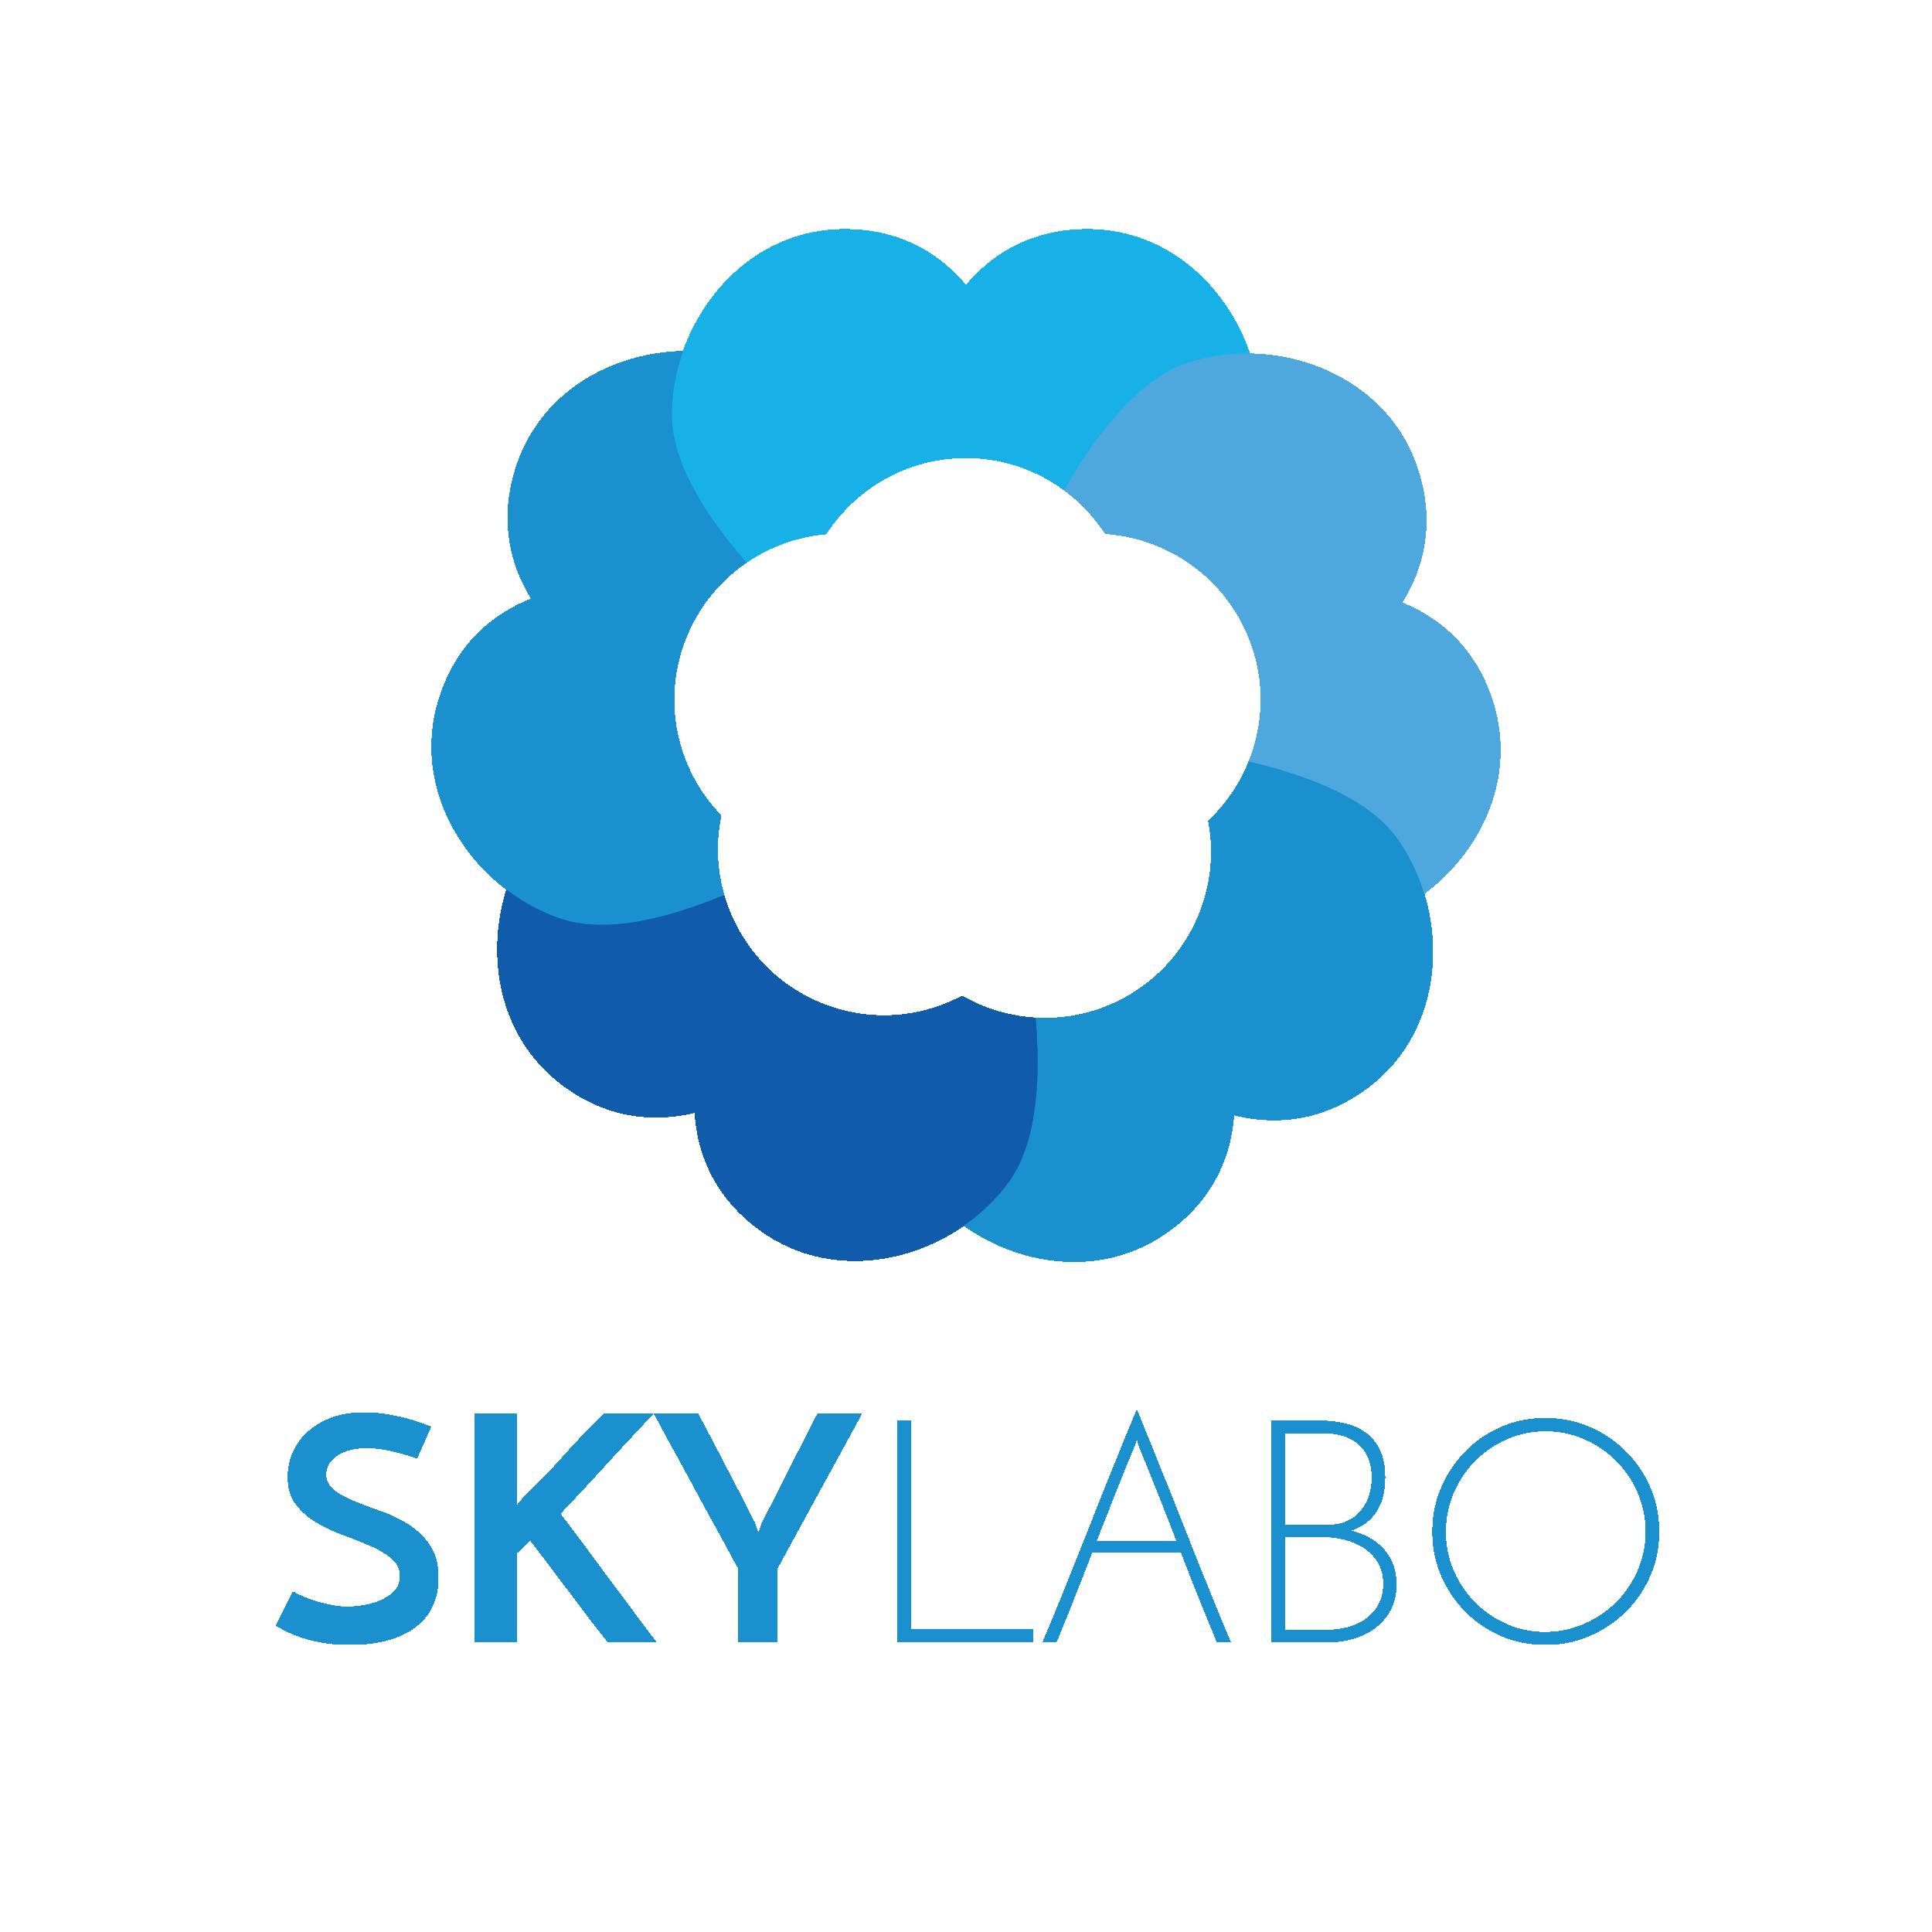 skylabo LOGOS-11.png